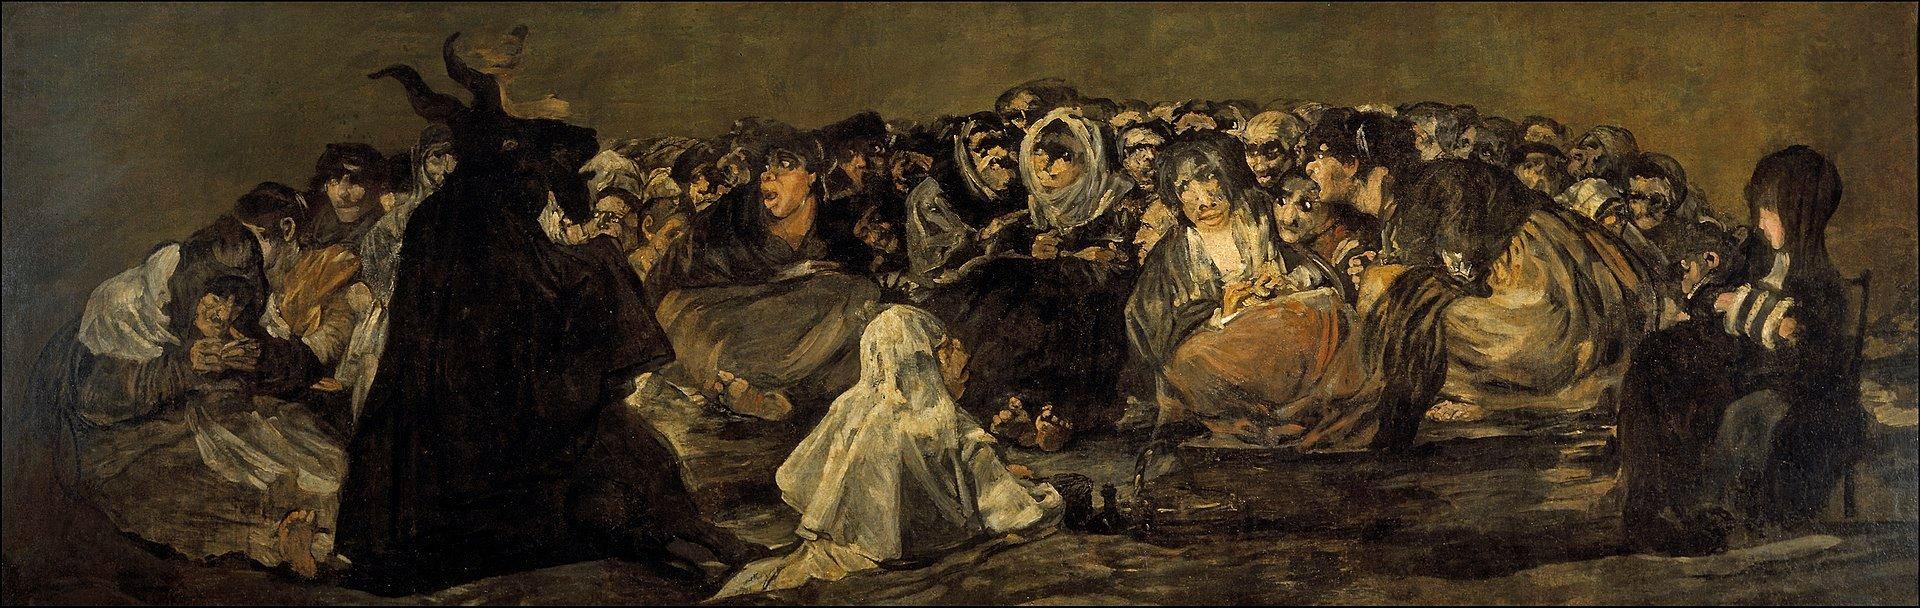 Aquelarre painting by Francisco Goya